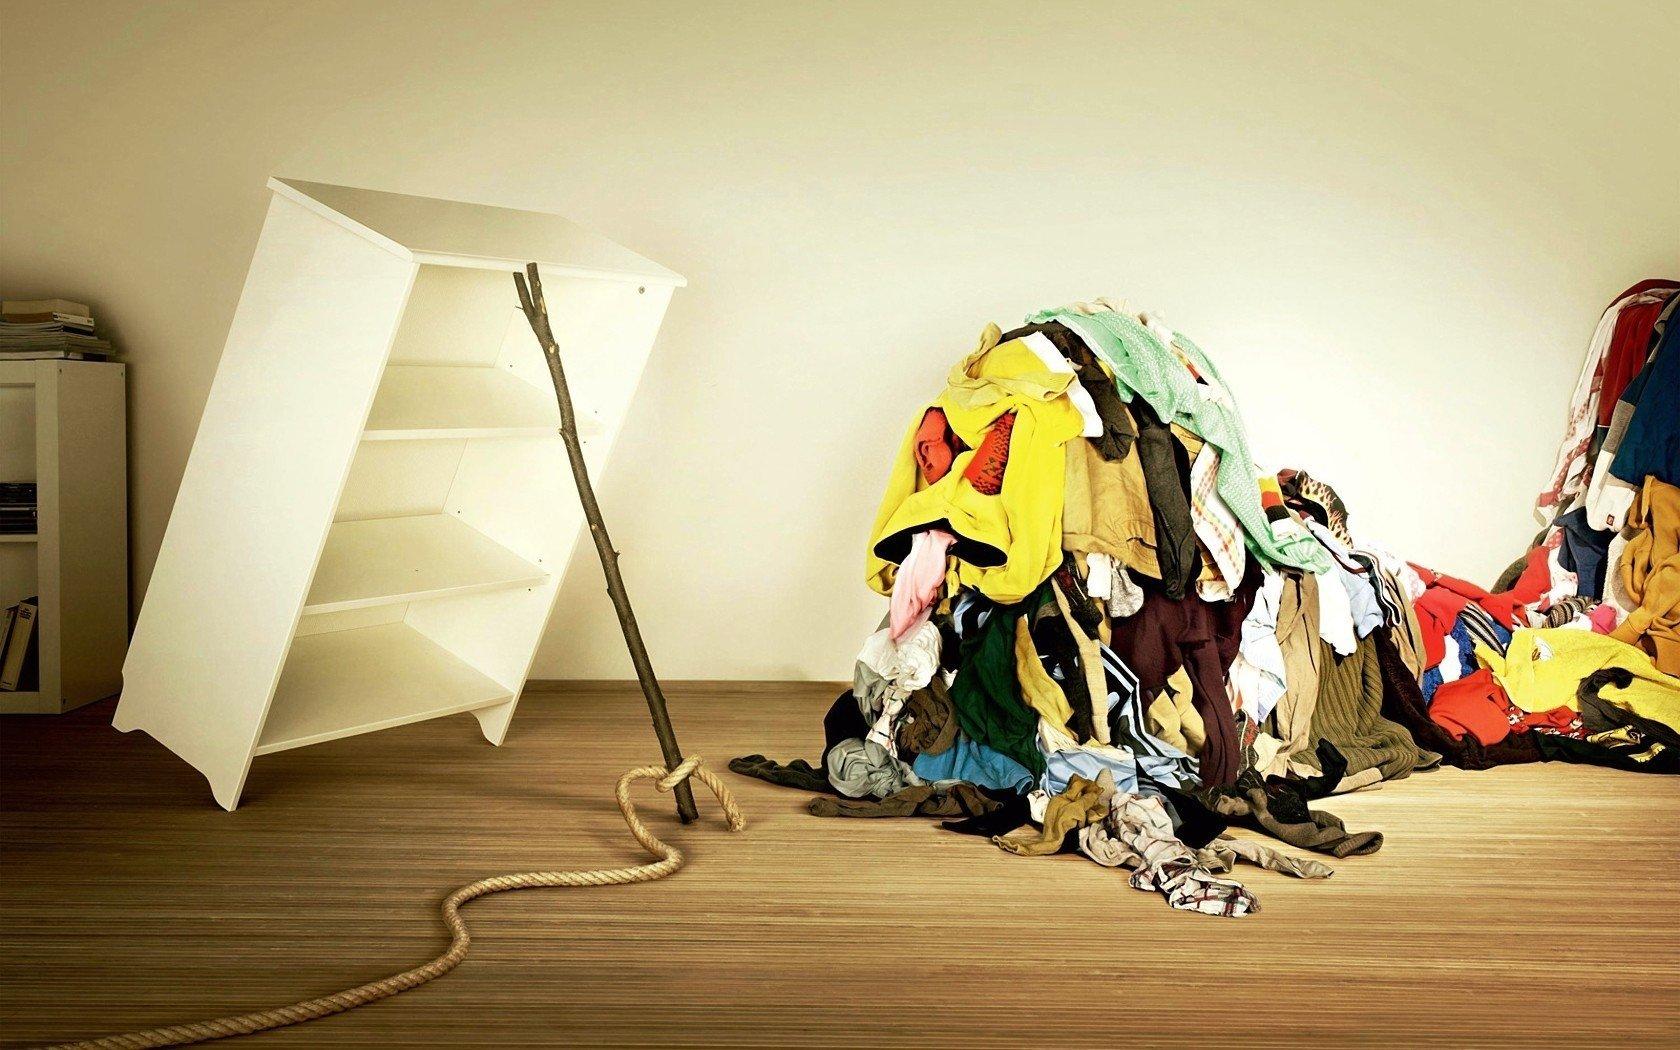 amusant fond d 39 cran and arri re plan 1680x1050 id 184171. Black Bedroom Furniture Sets. Home Design Ideas